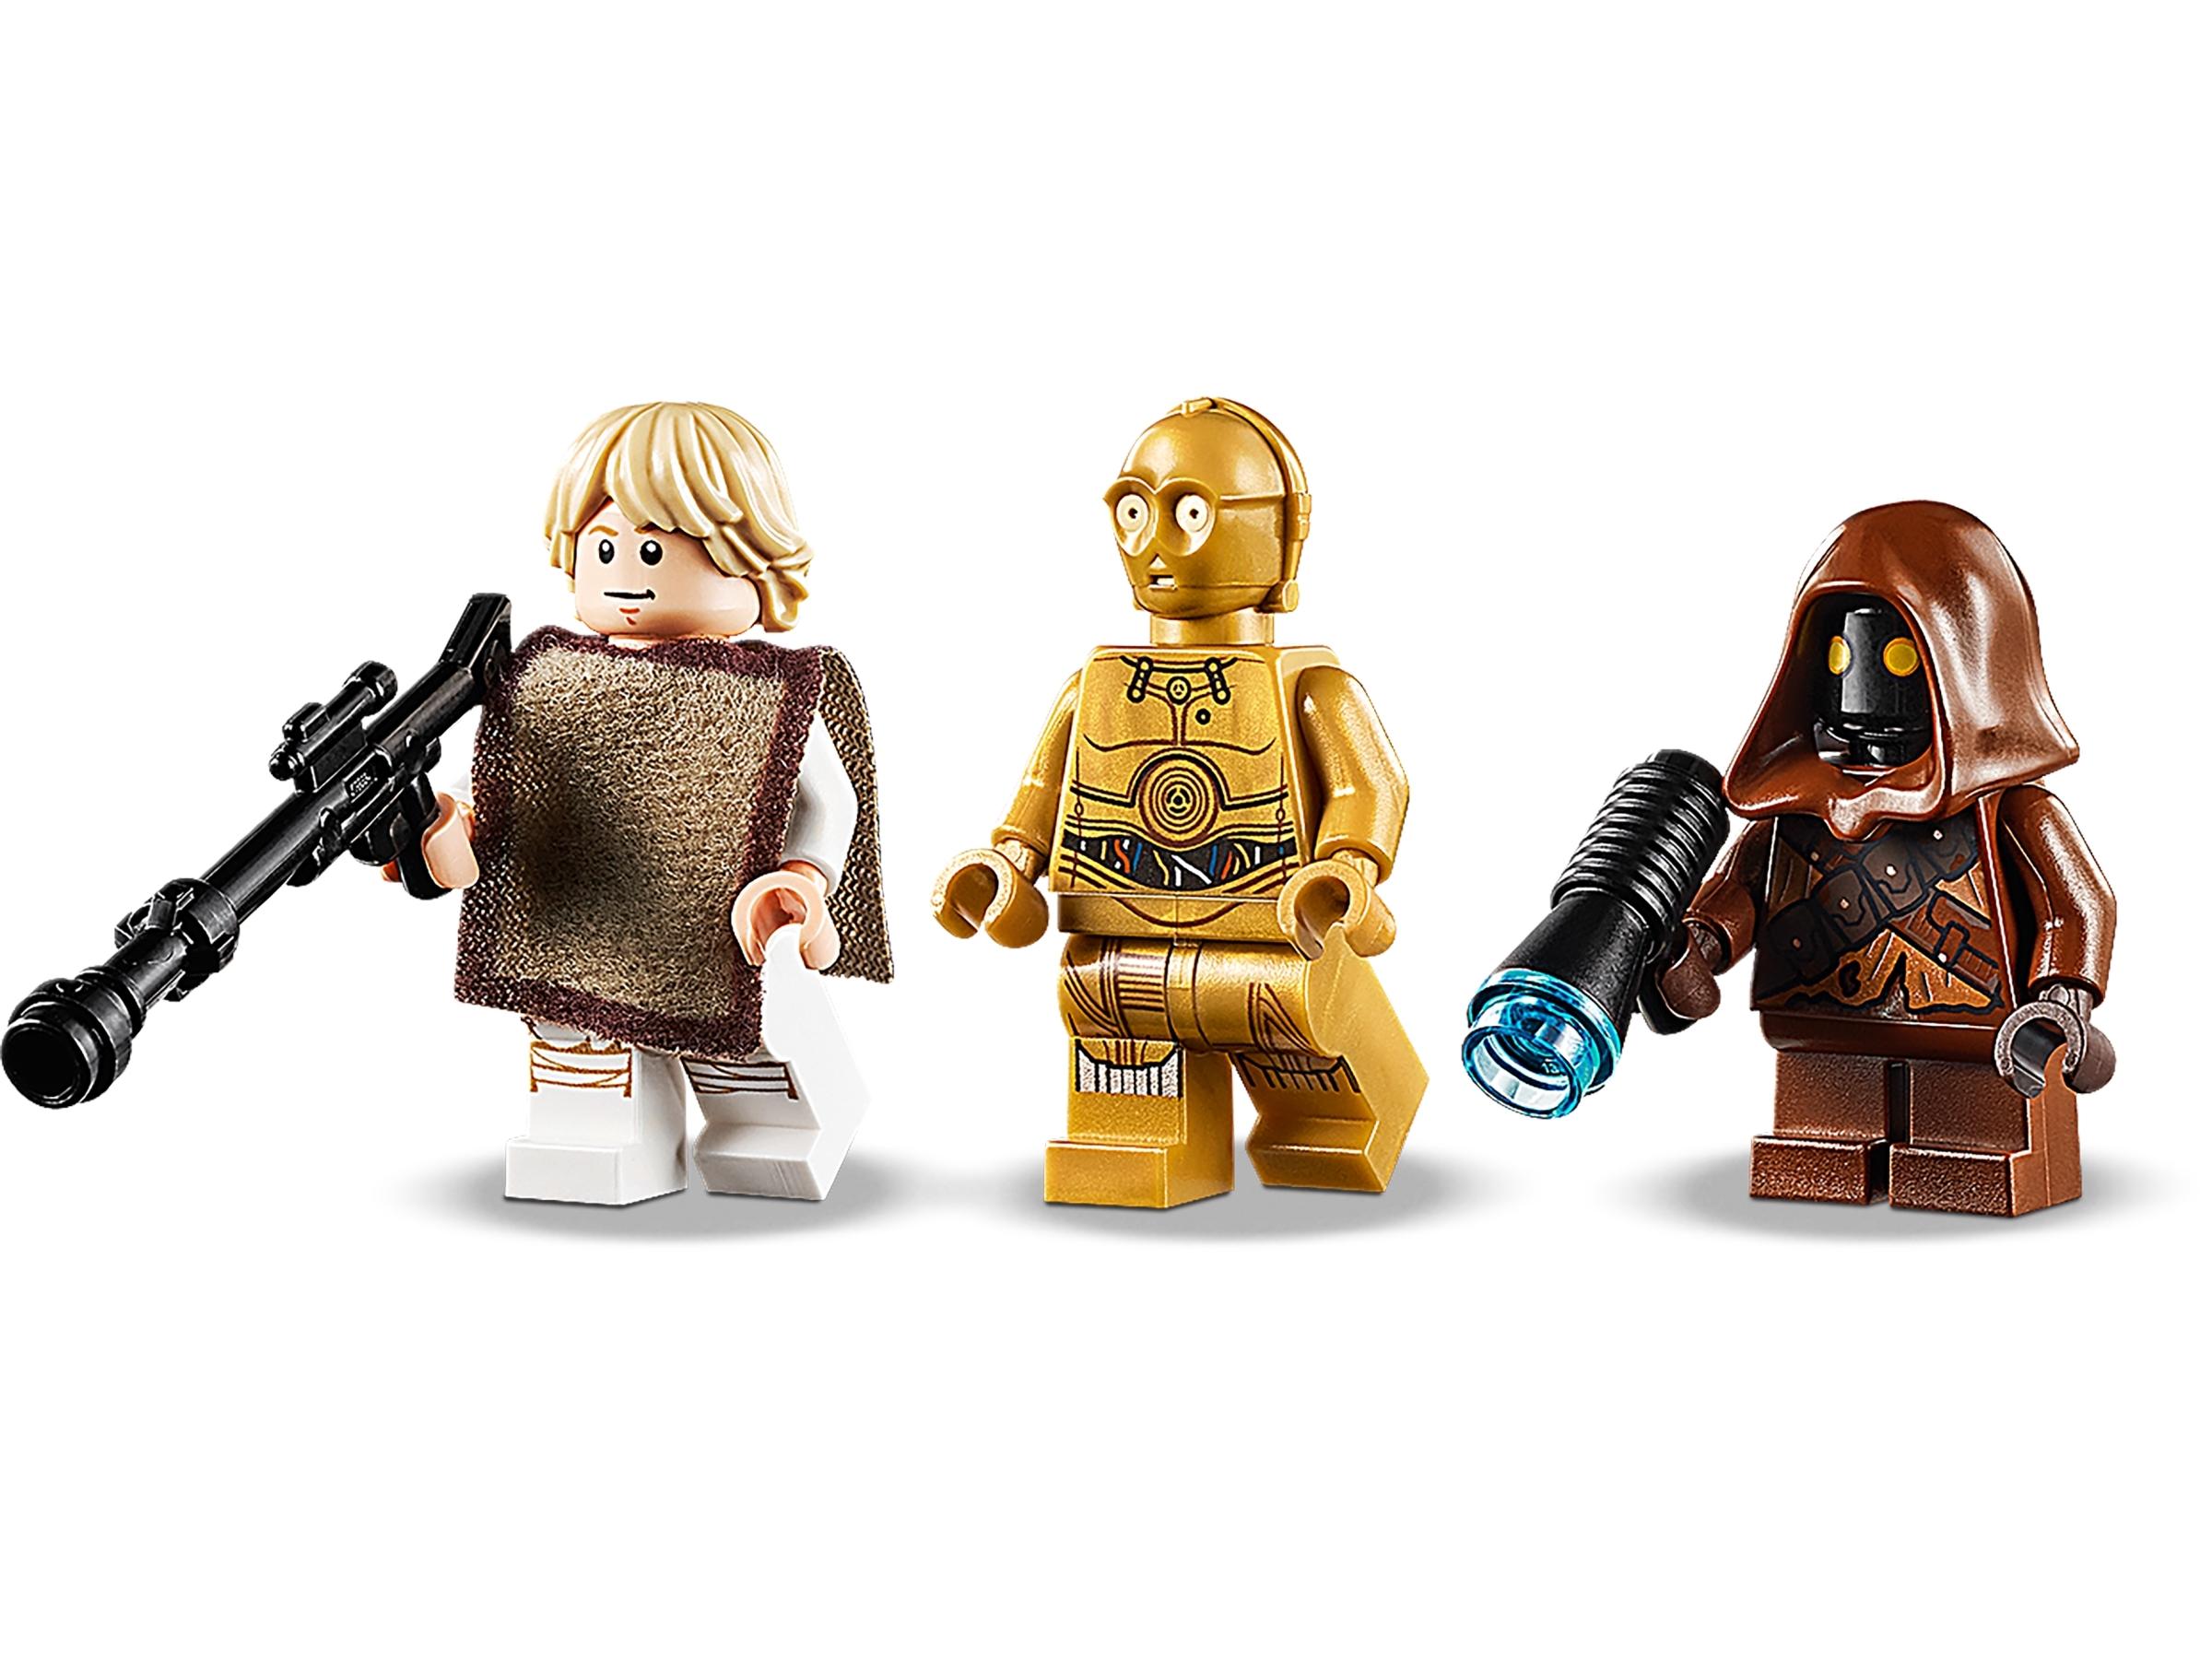 LEGO StarWars 75271 Luke Skywalker's Landspeeder